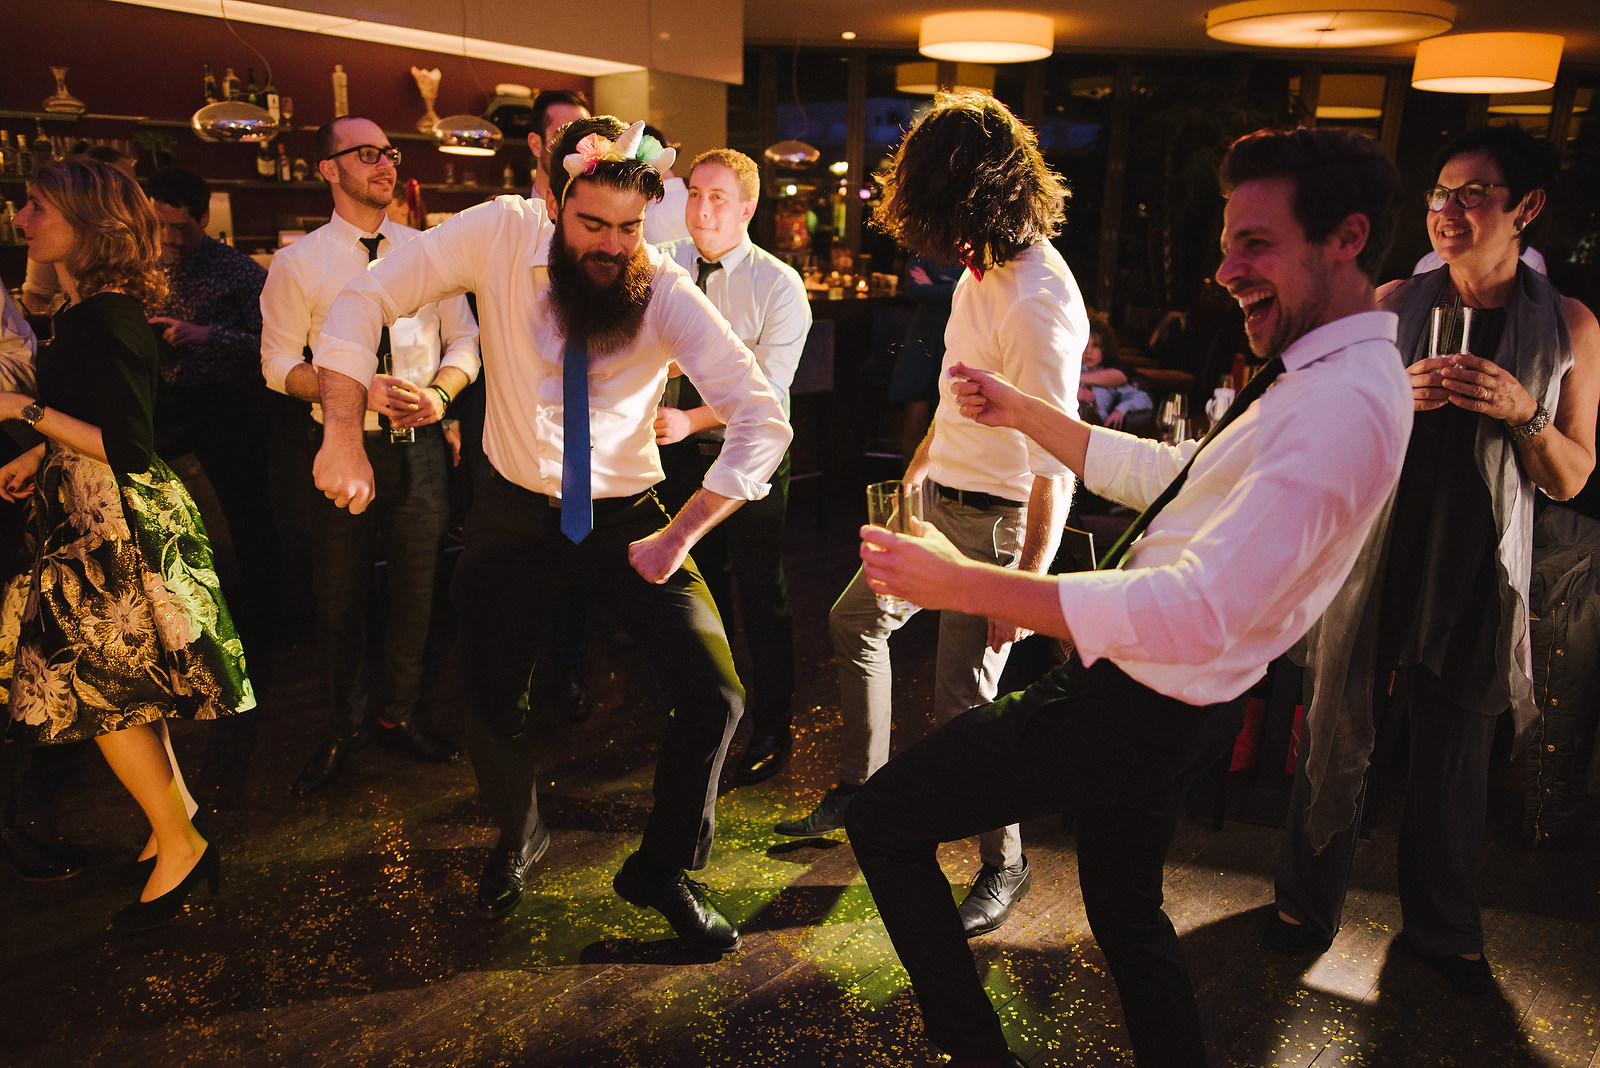 Fotograf Konstanz - Silvester Wedding in Hagnau / Friedrichshafen at Lake of Constance  - 60 -